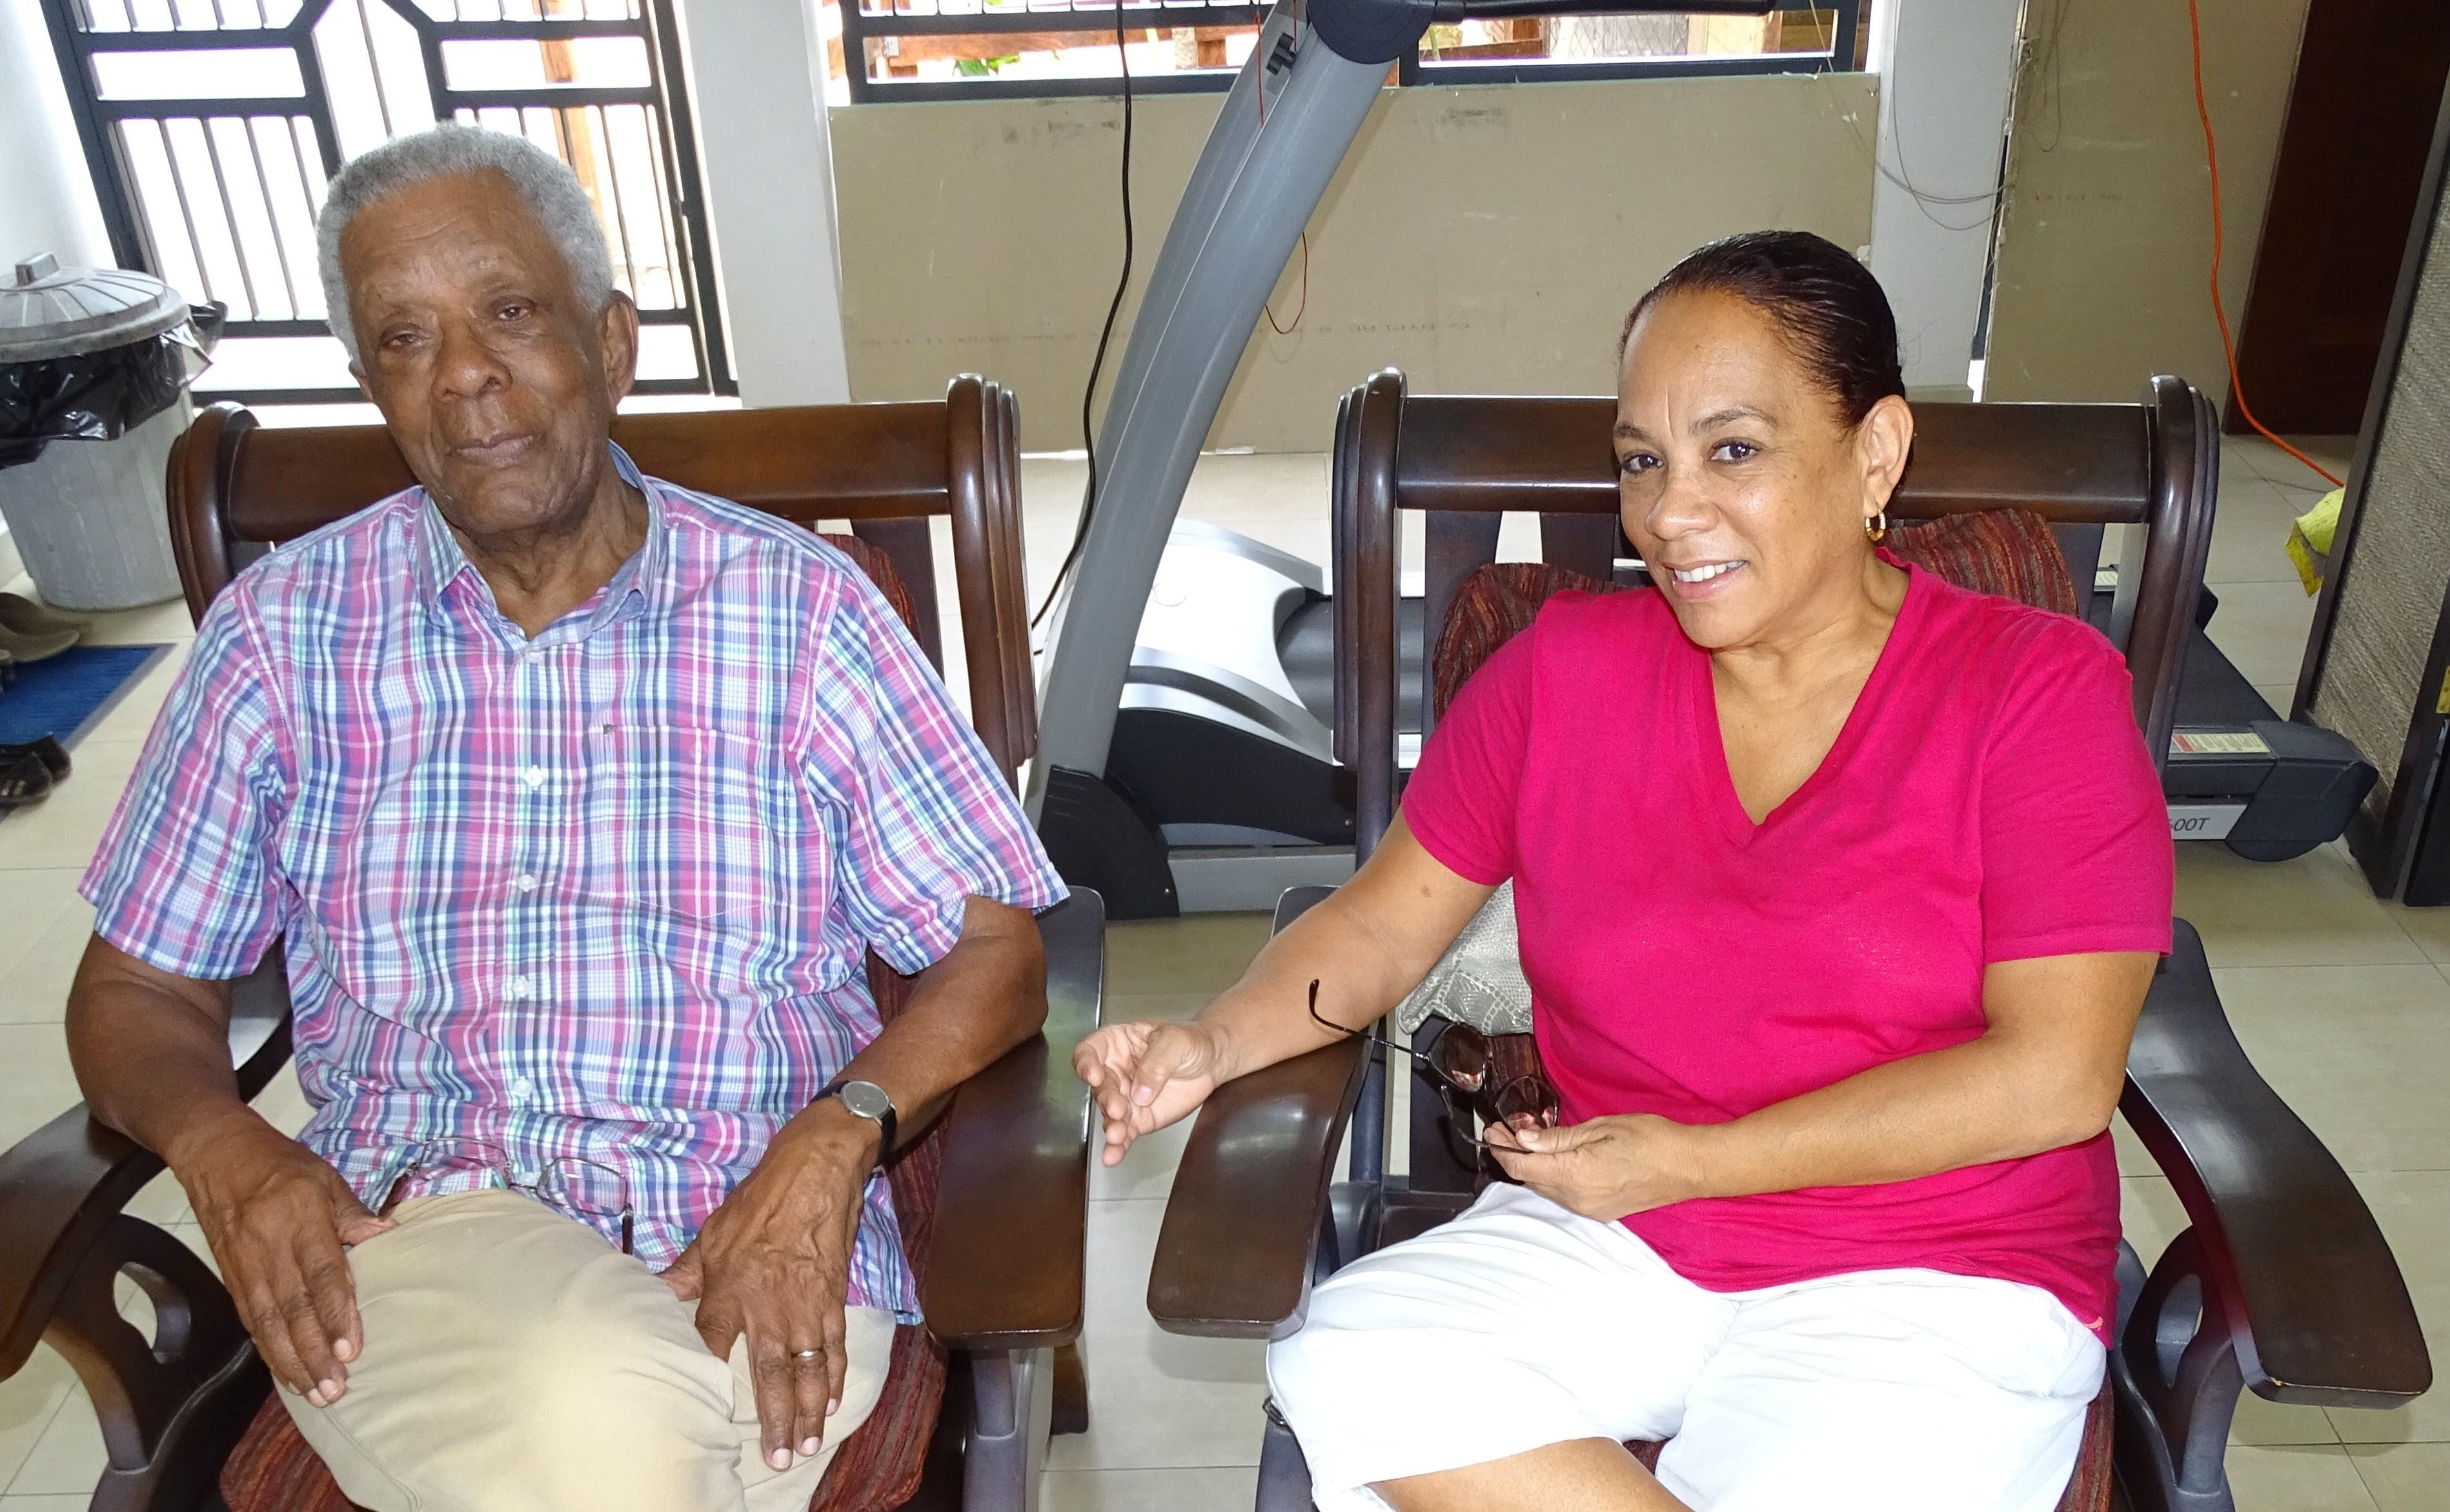 Carla Bakboord interviewt dhr Hein Eersel, literator Surinaams taalkundige en Surinamist.